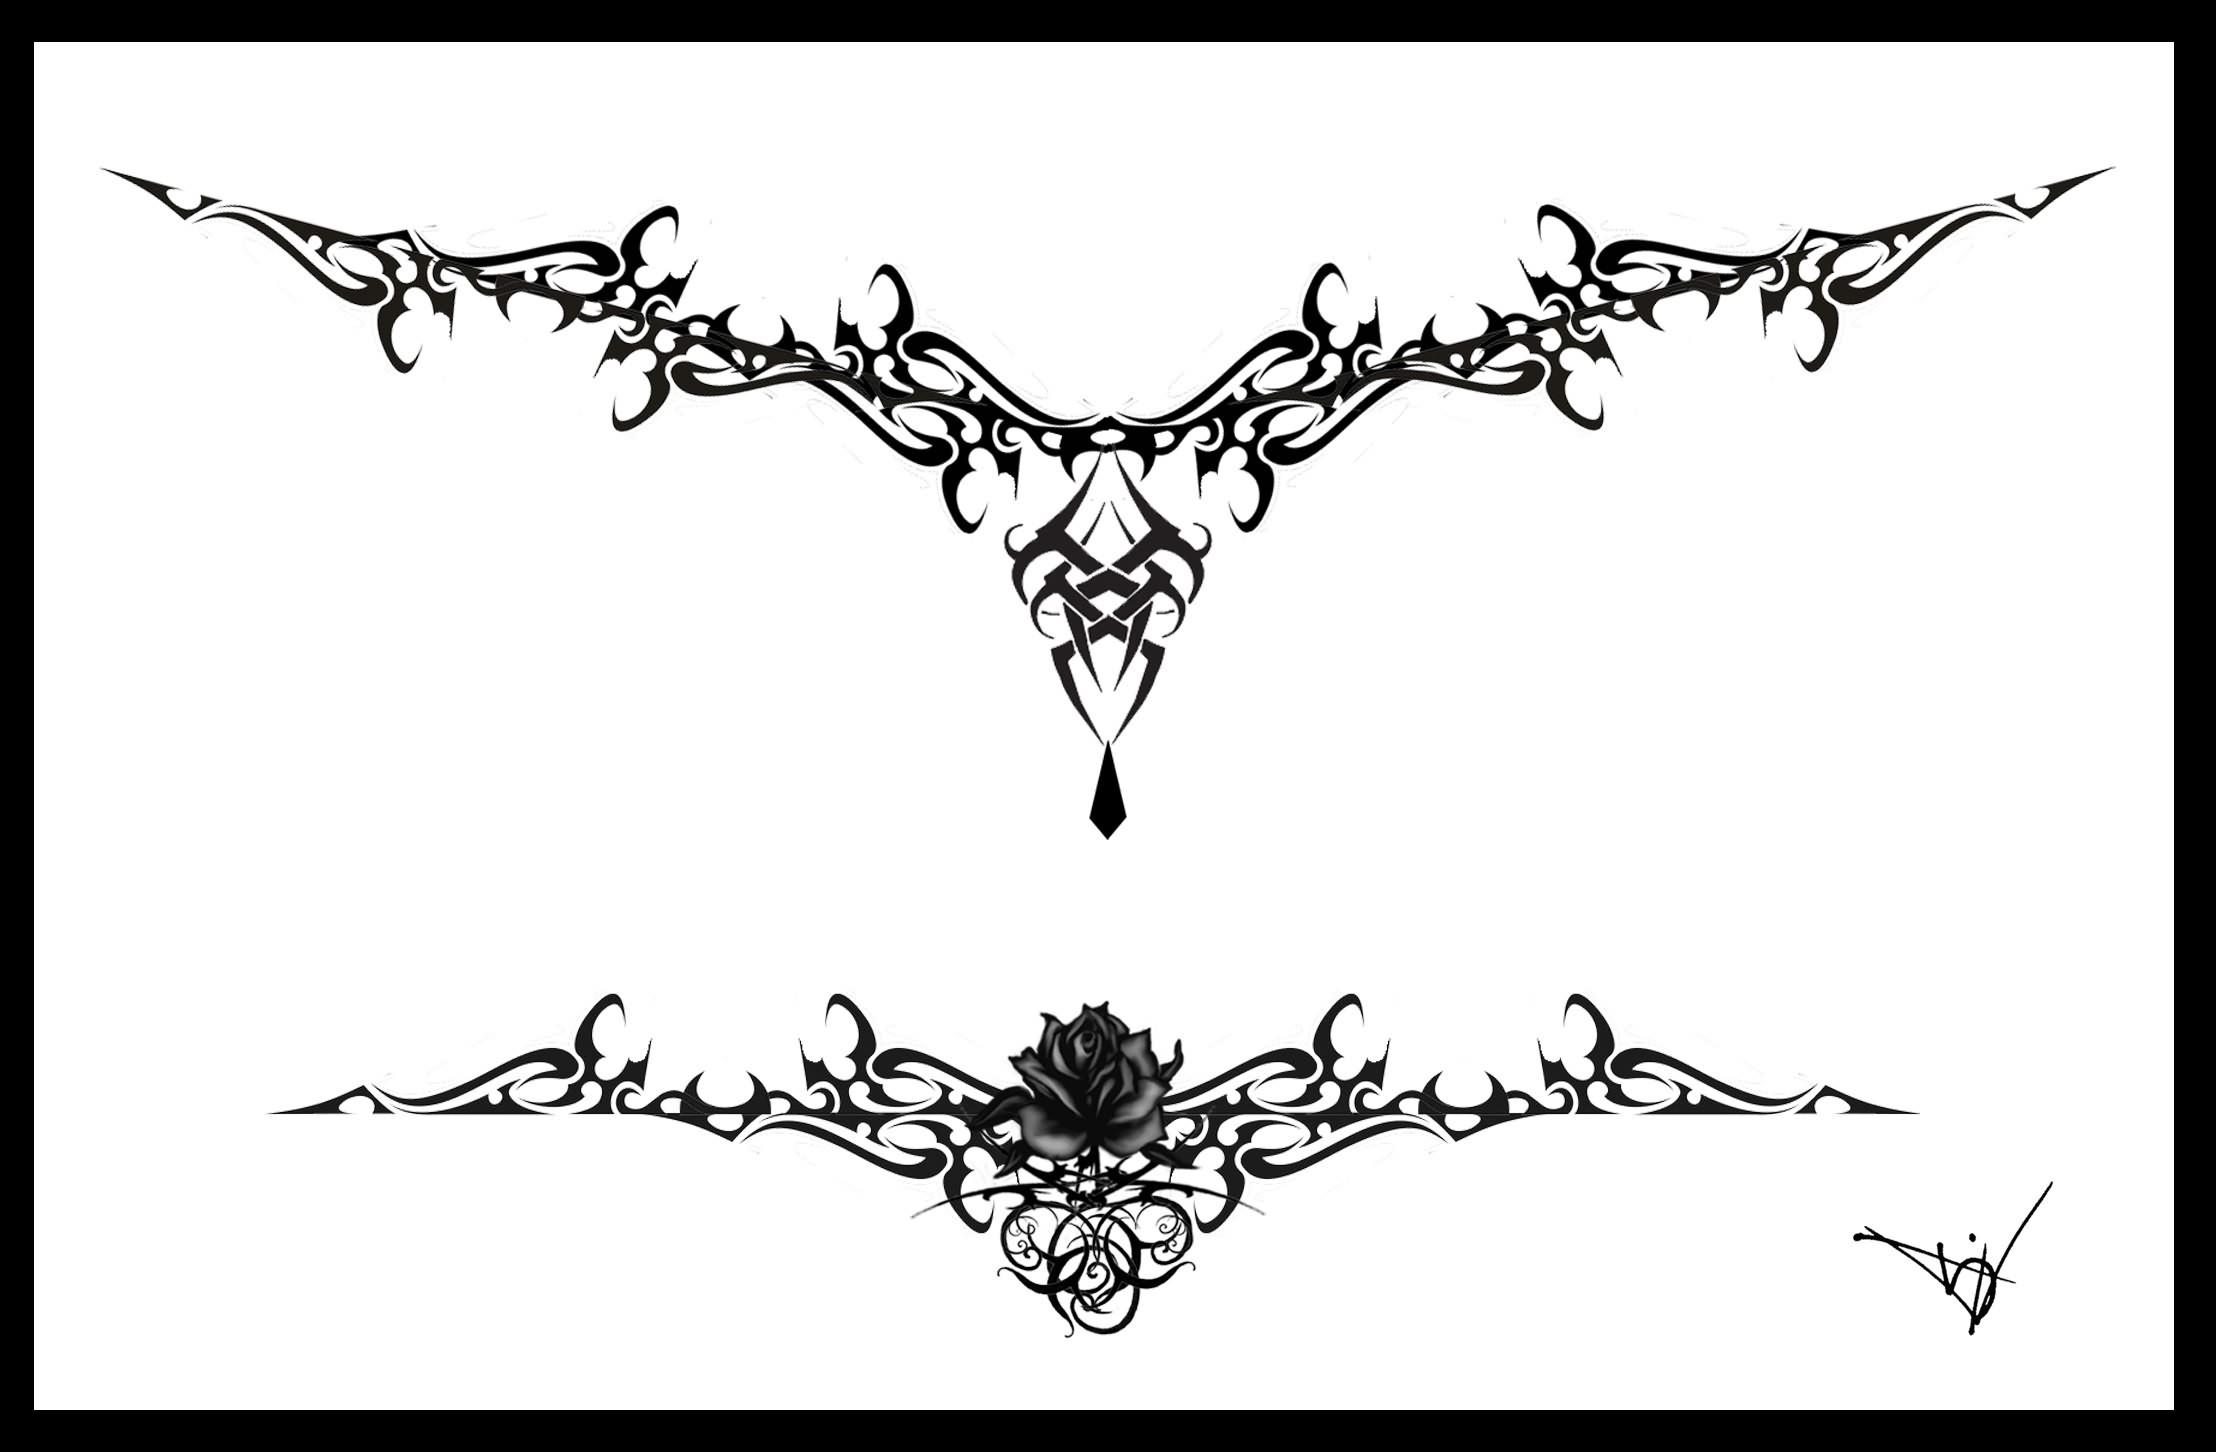 Tattoo designs uk women gothic tattoo ideas for women